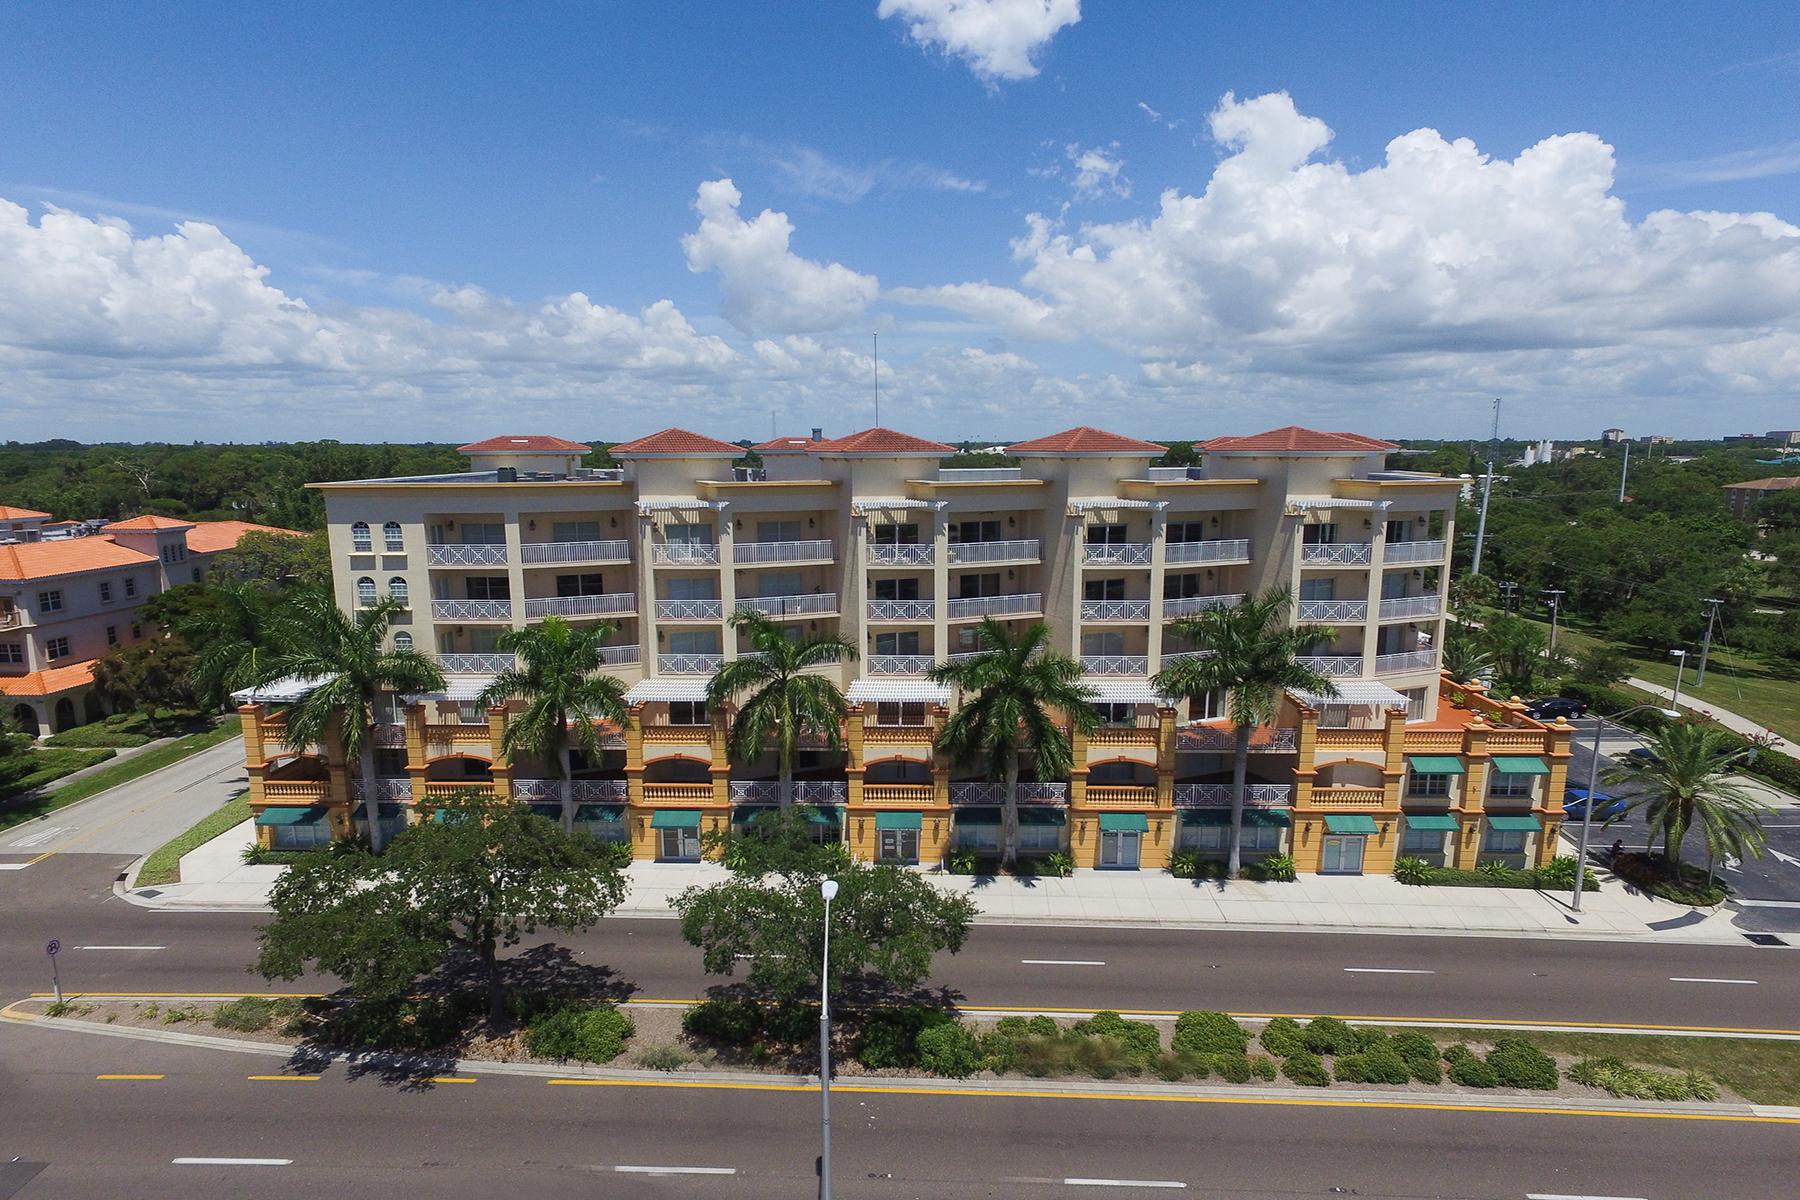 Condominium for Sale at SAN MARCO 1188 N Tamiami Trl 203 Sarasota, Florida, 34236 United States